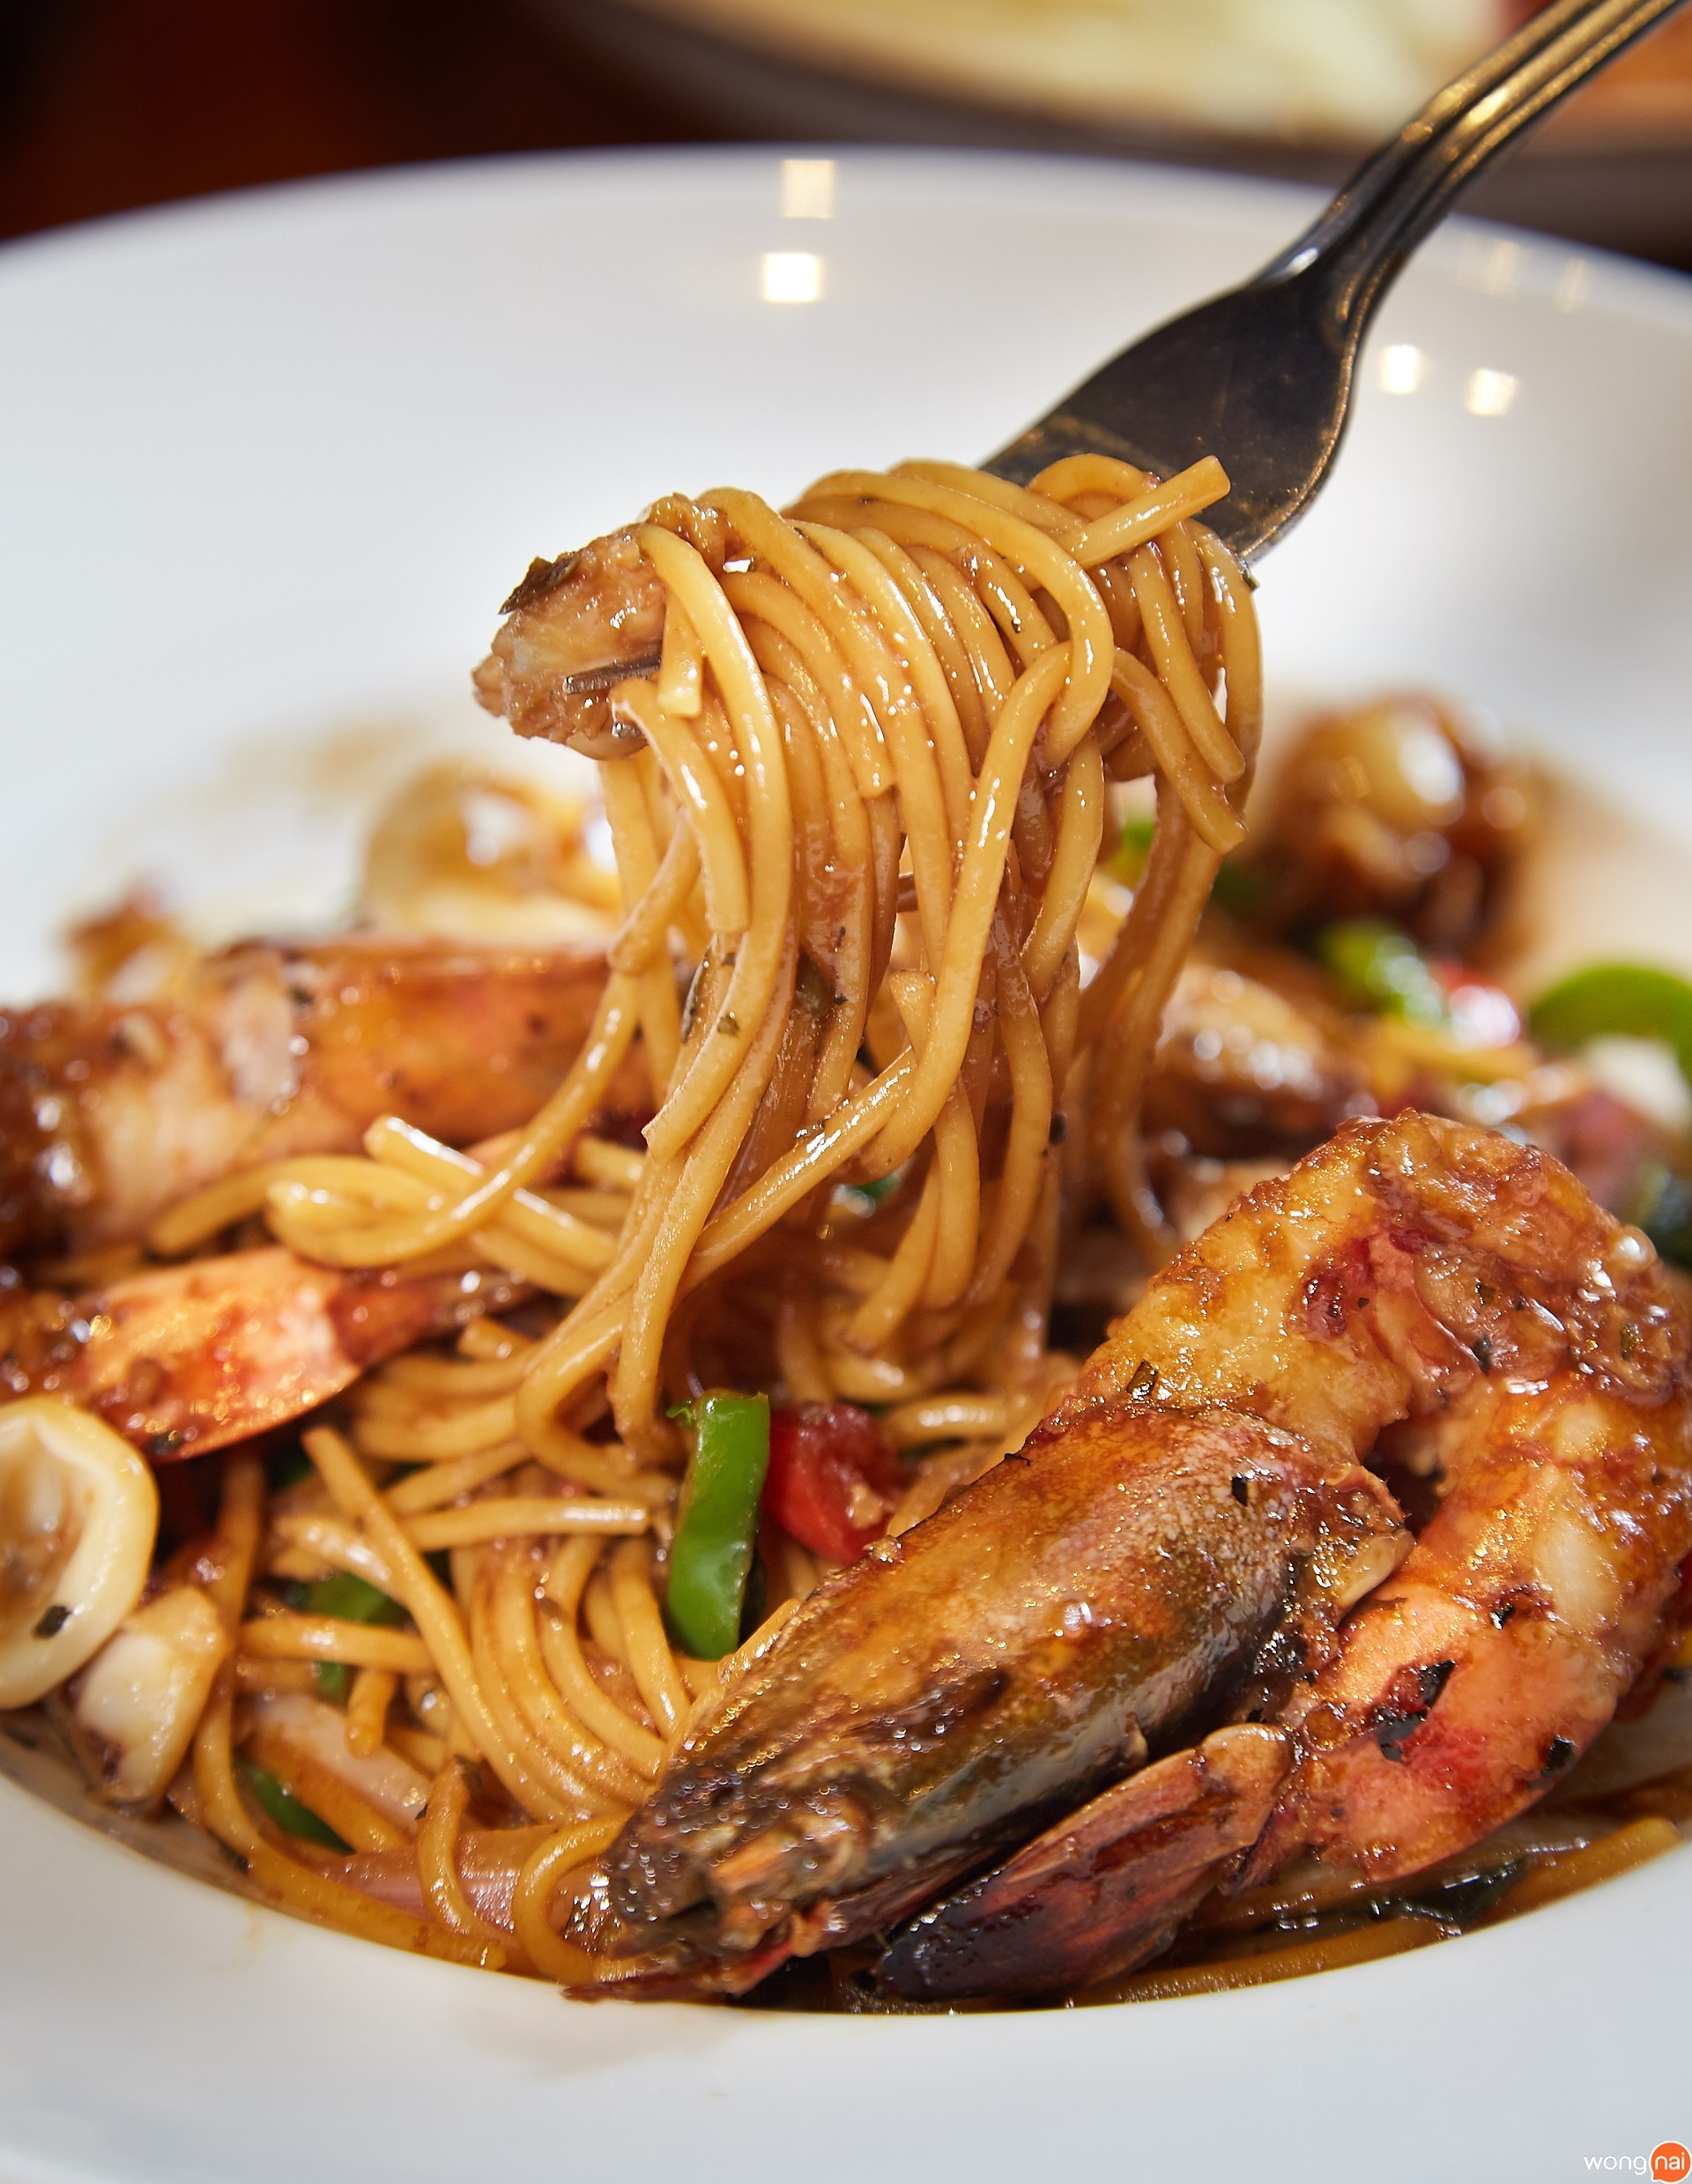 The Seafood Spaghetti Hard Rock Cafe pattaya